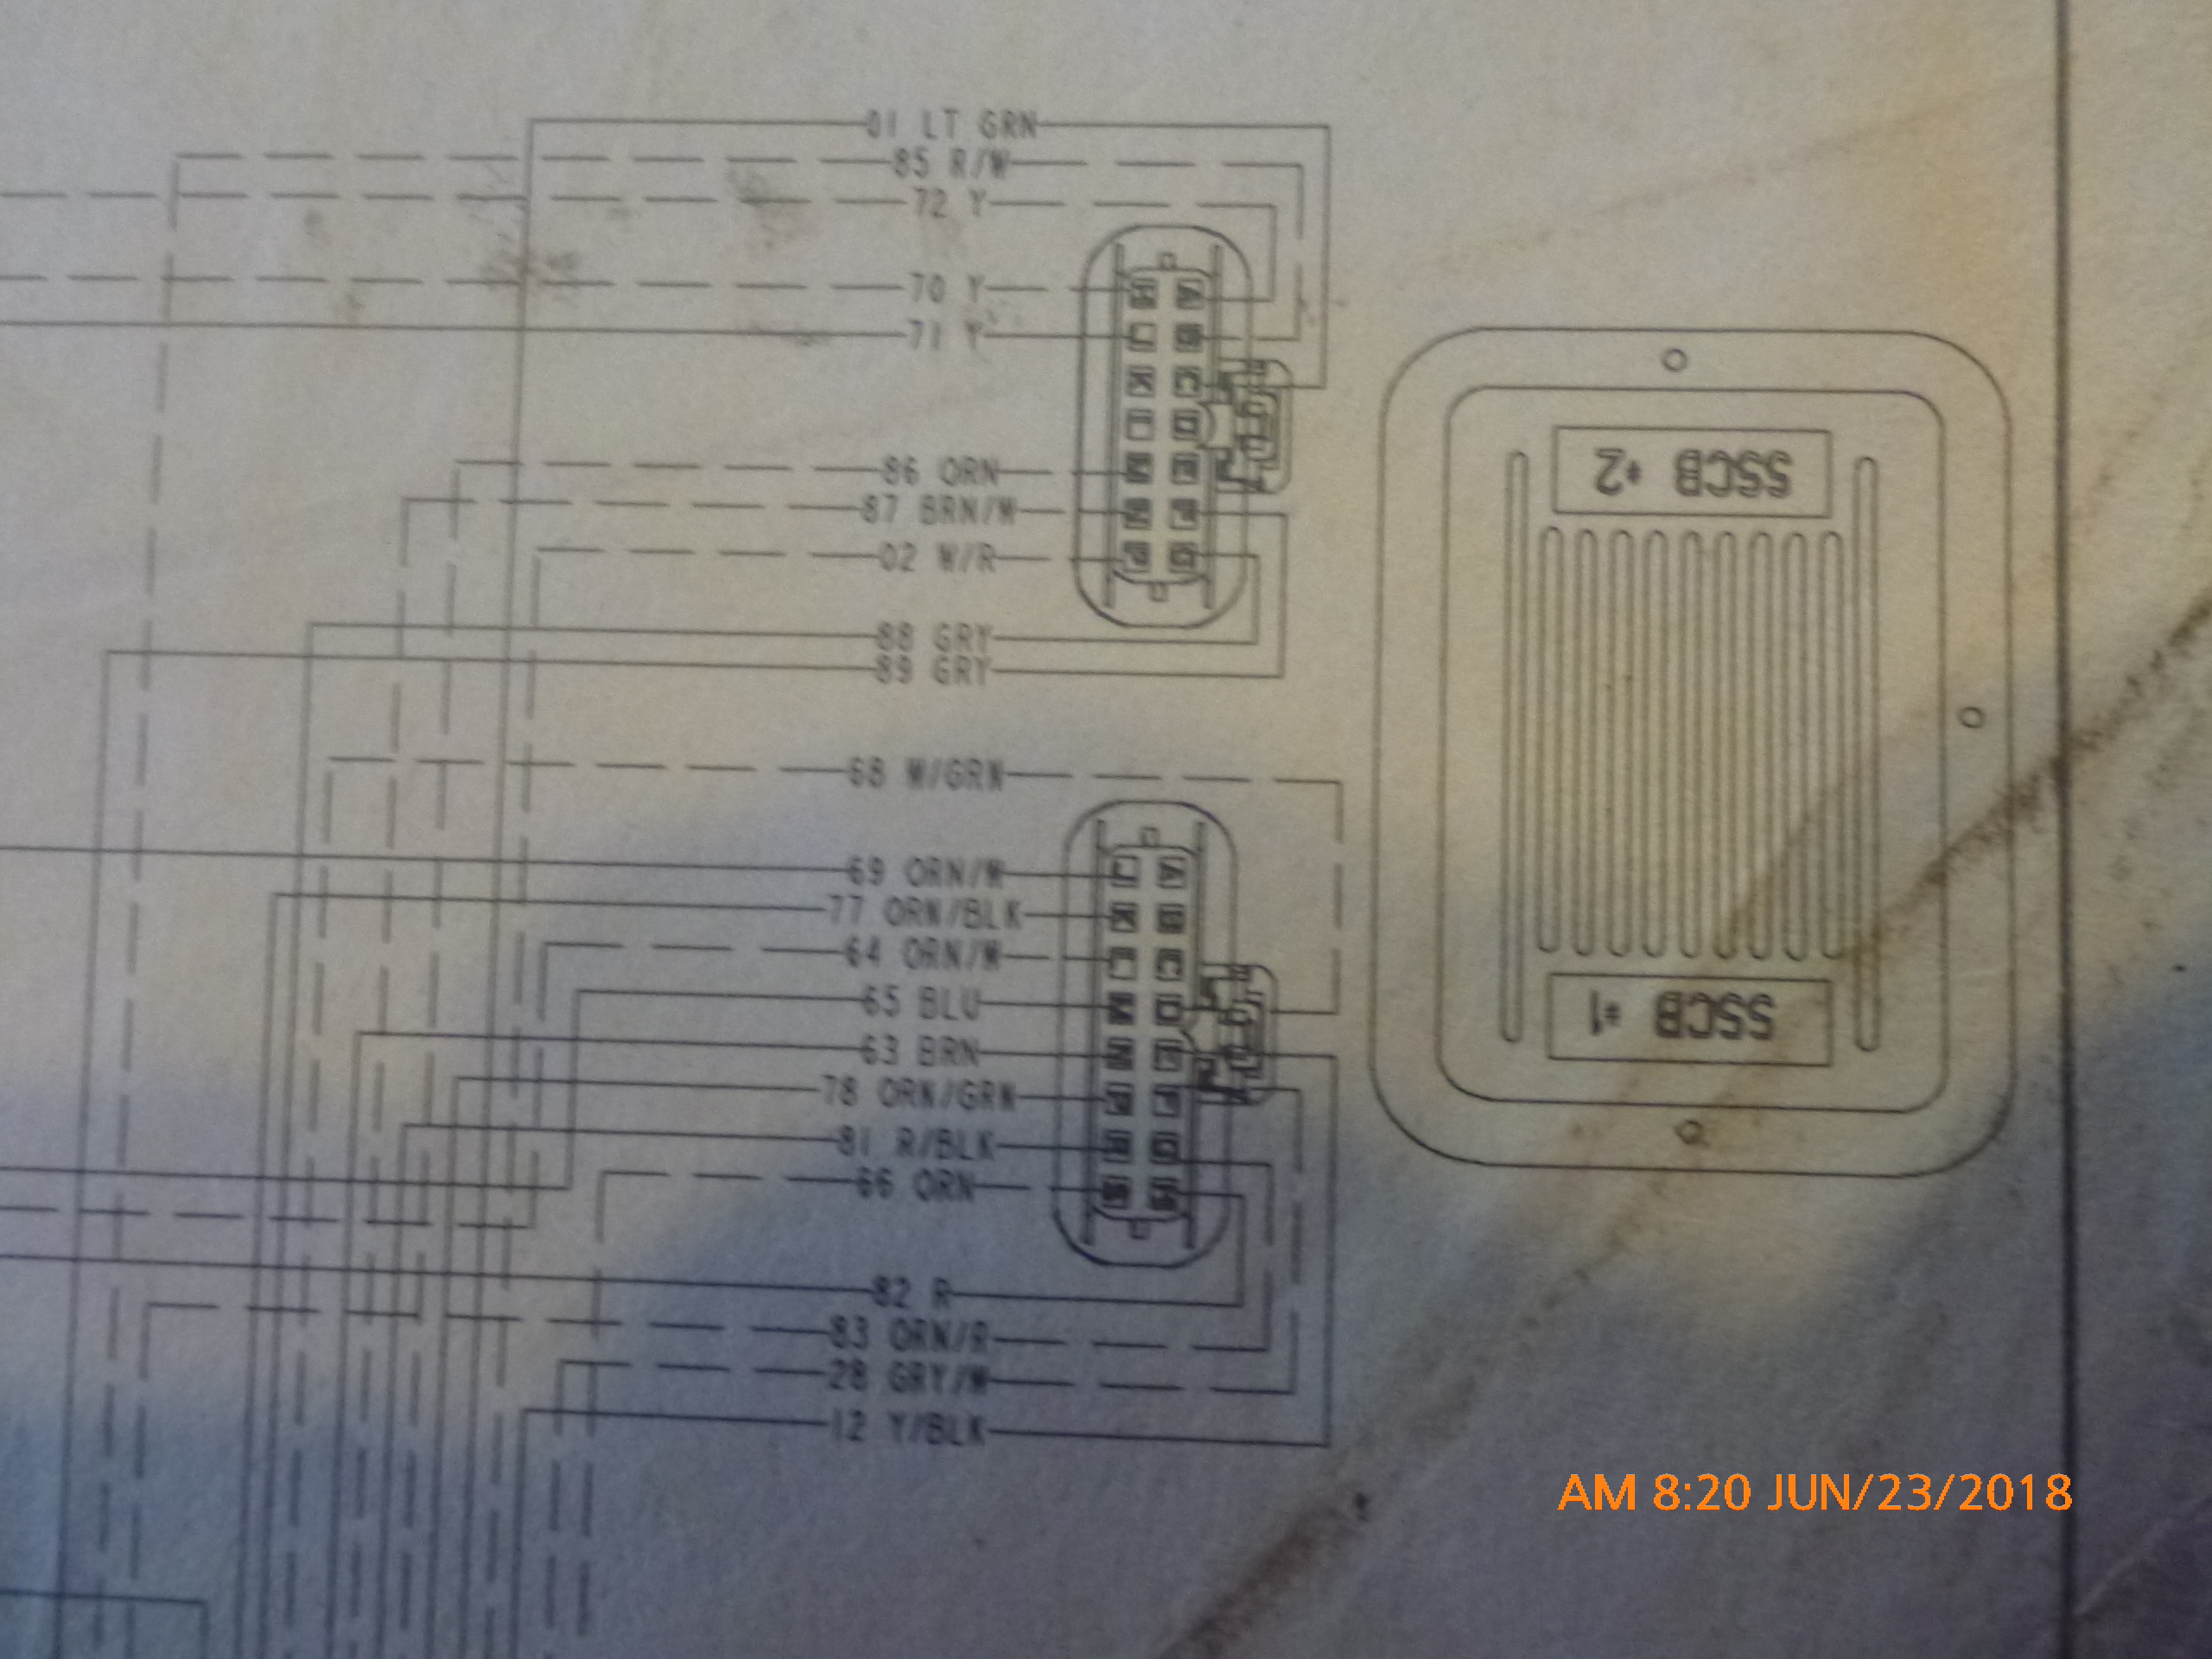 2006 Polaris Ranger Xp 700 Wire Help